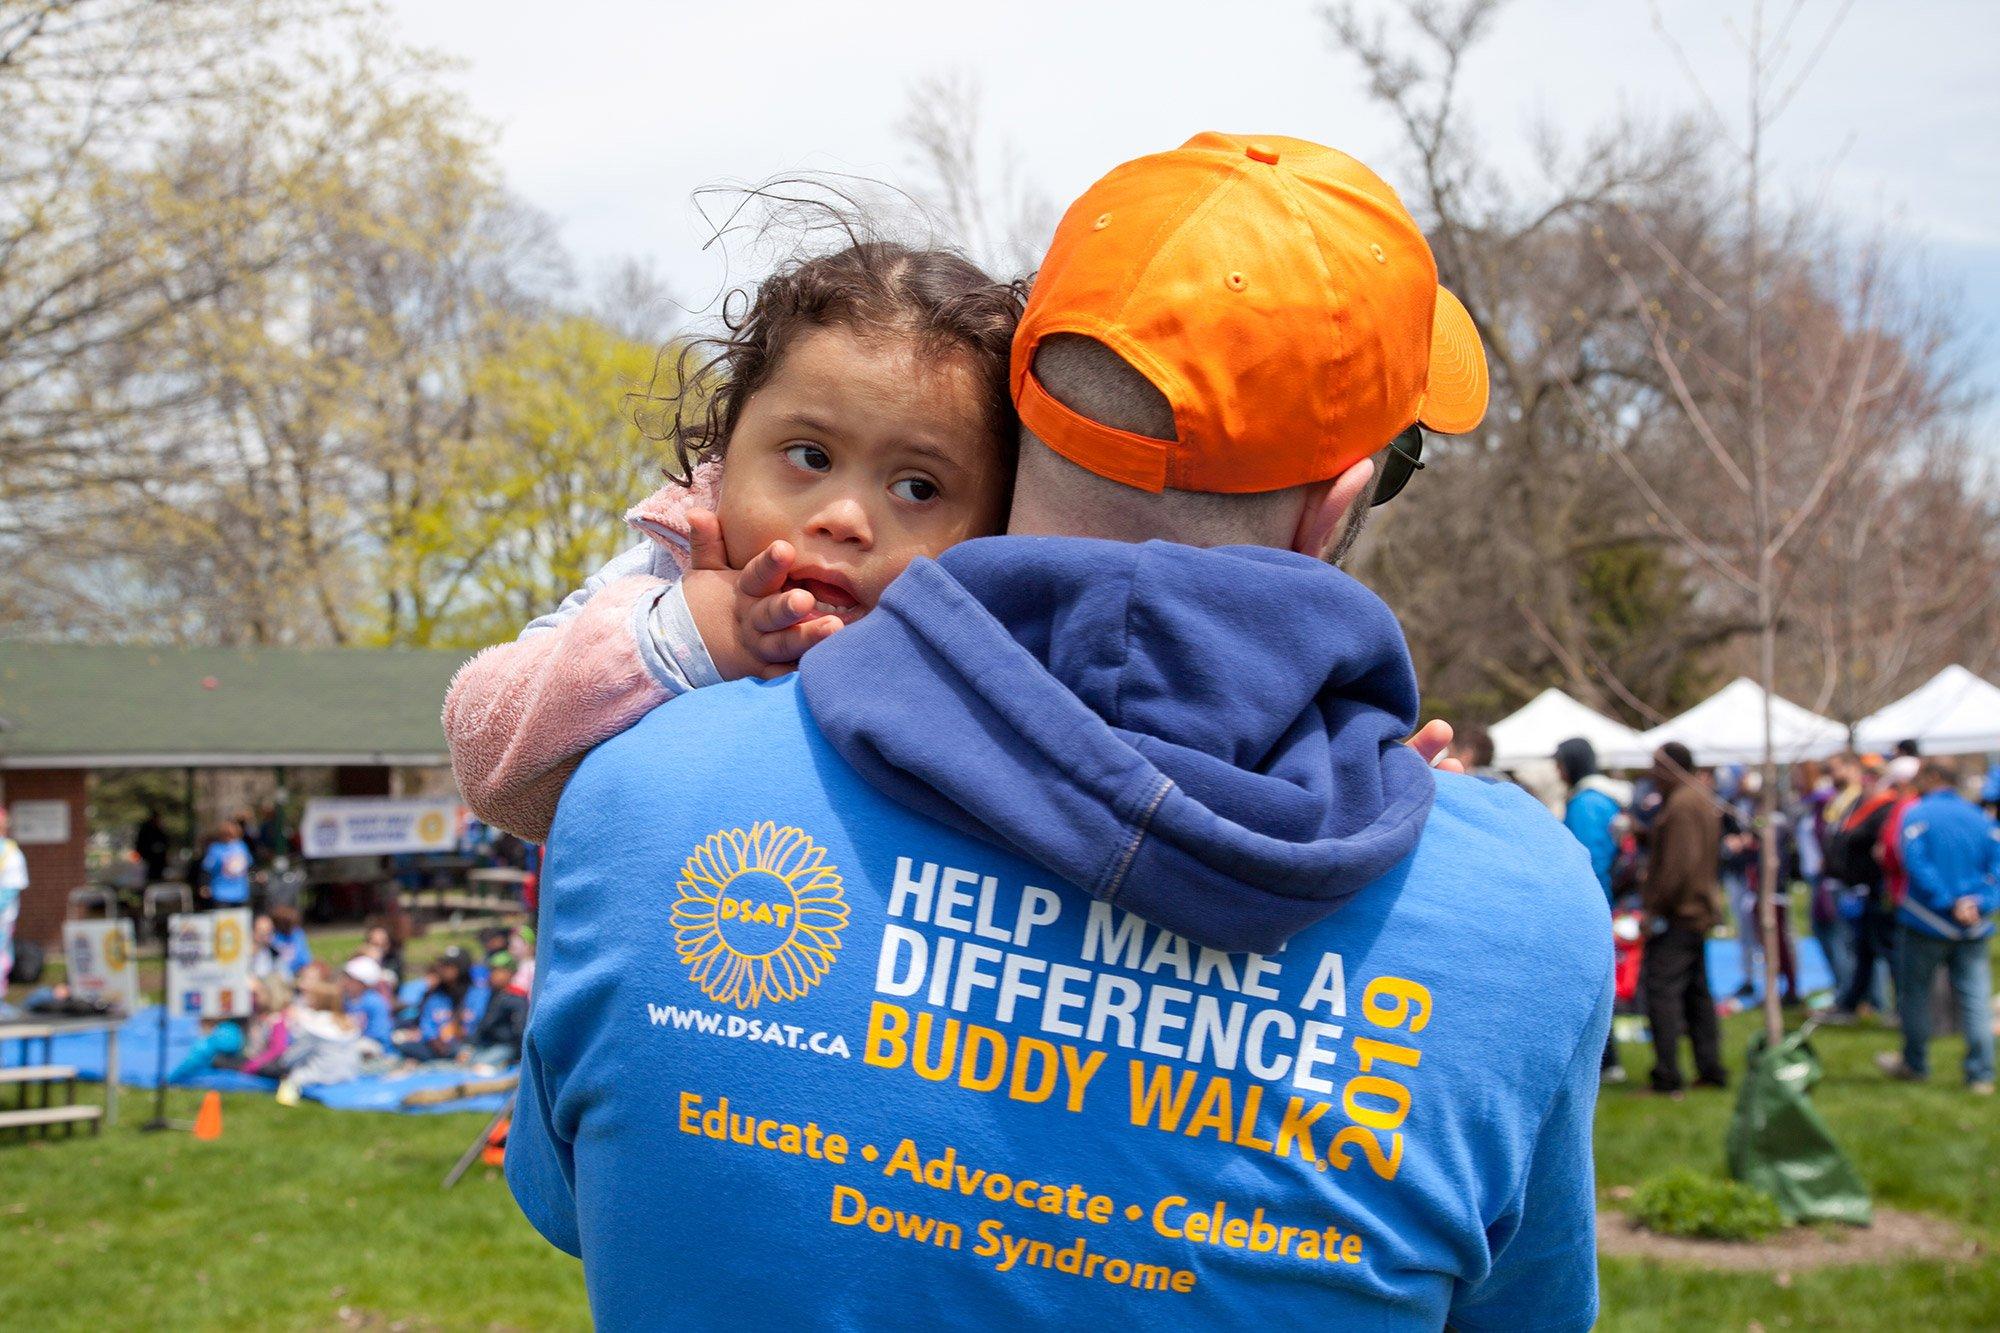 volunteer with buddy walk